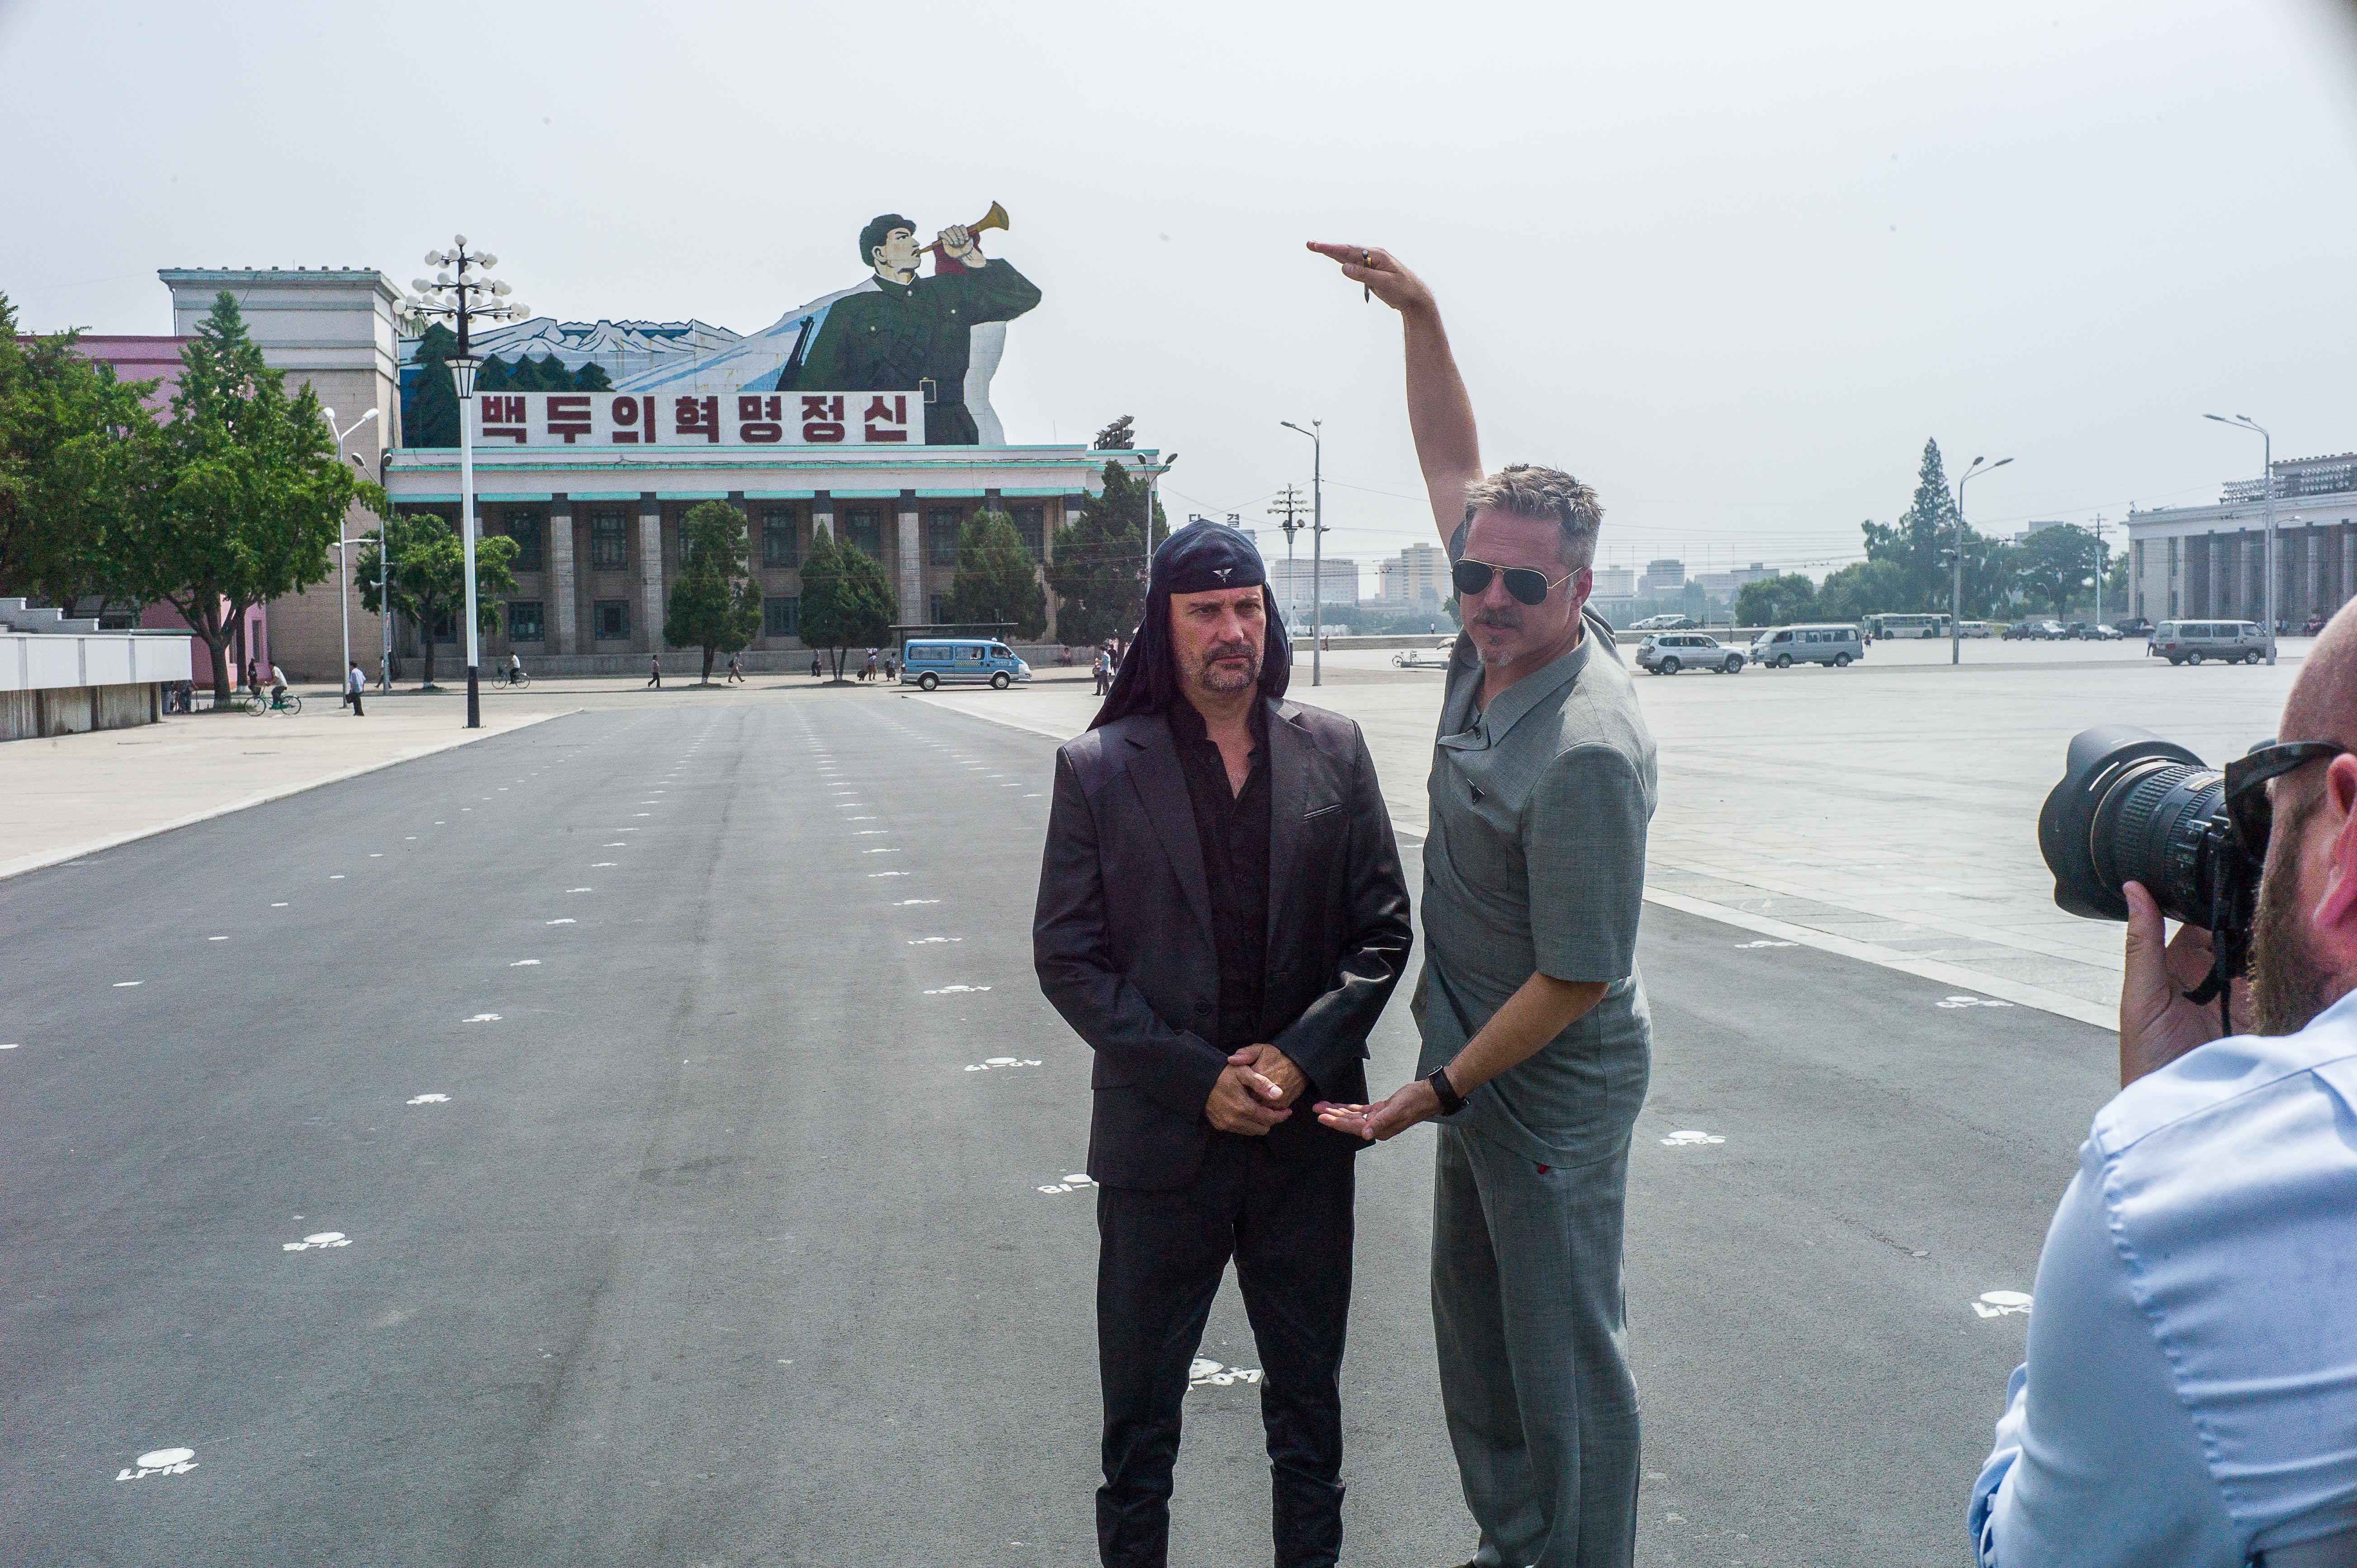 Milan Fras (Laibach) and Traavik Morten